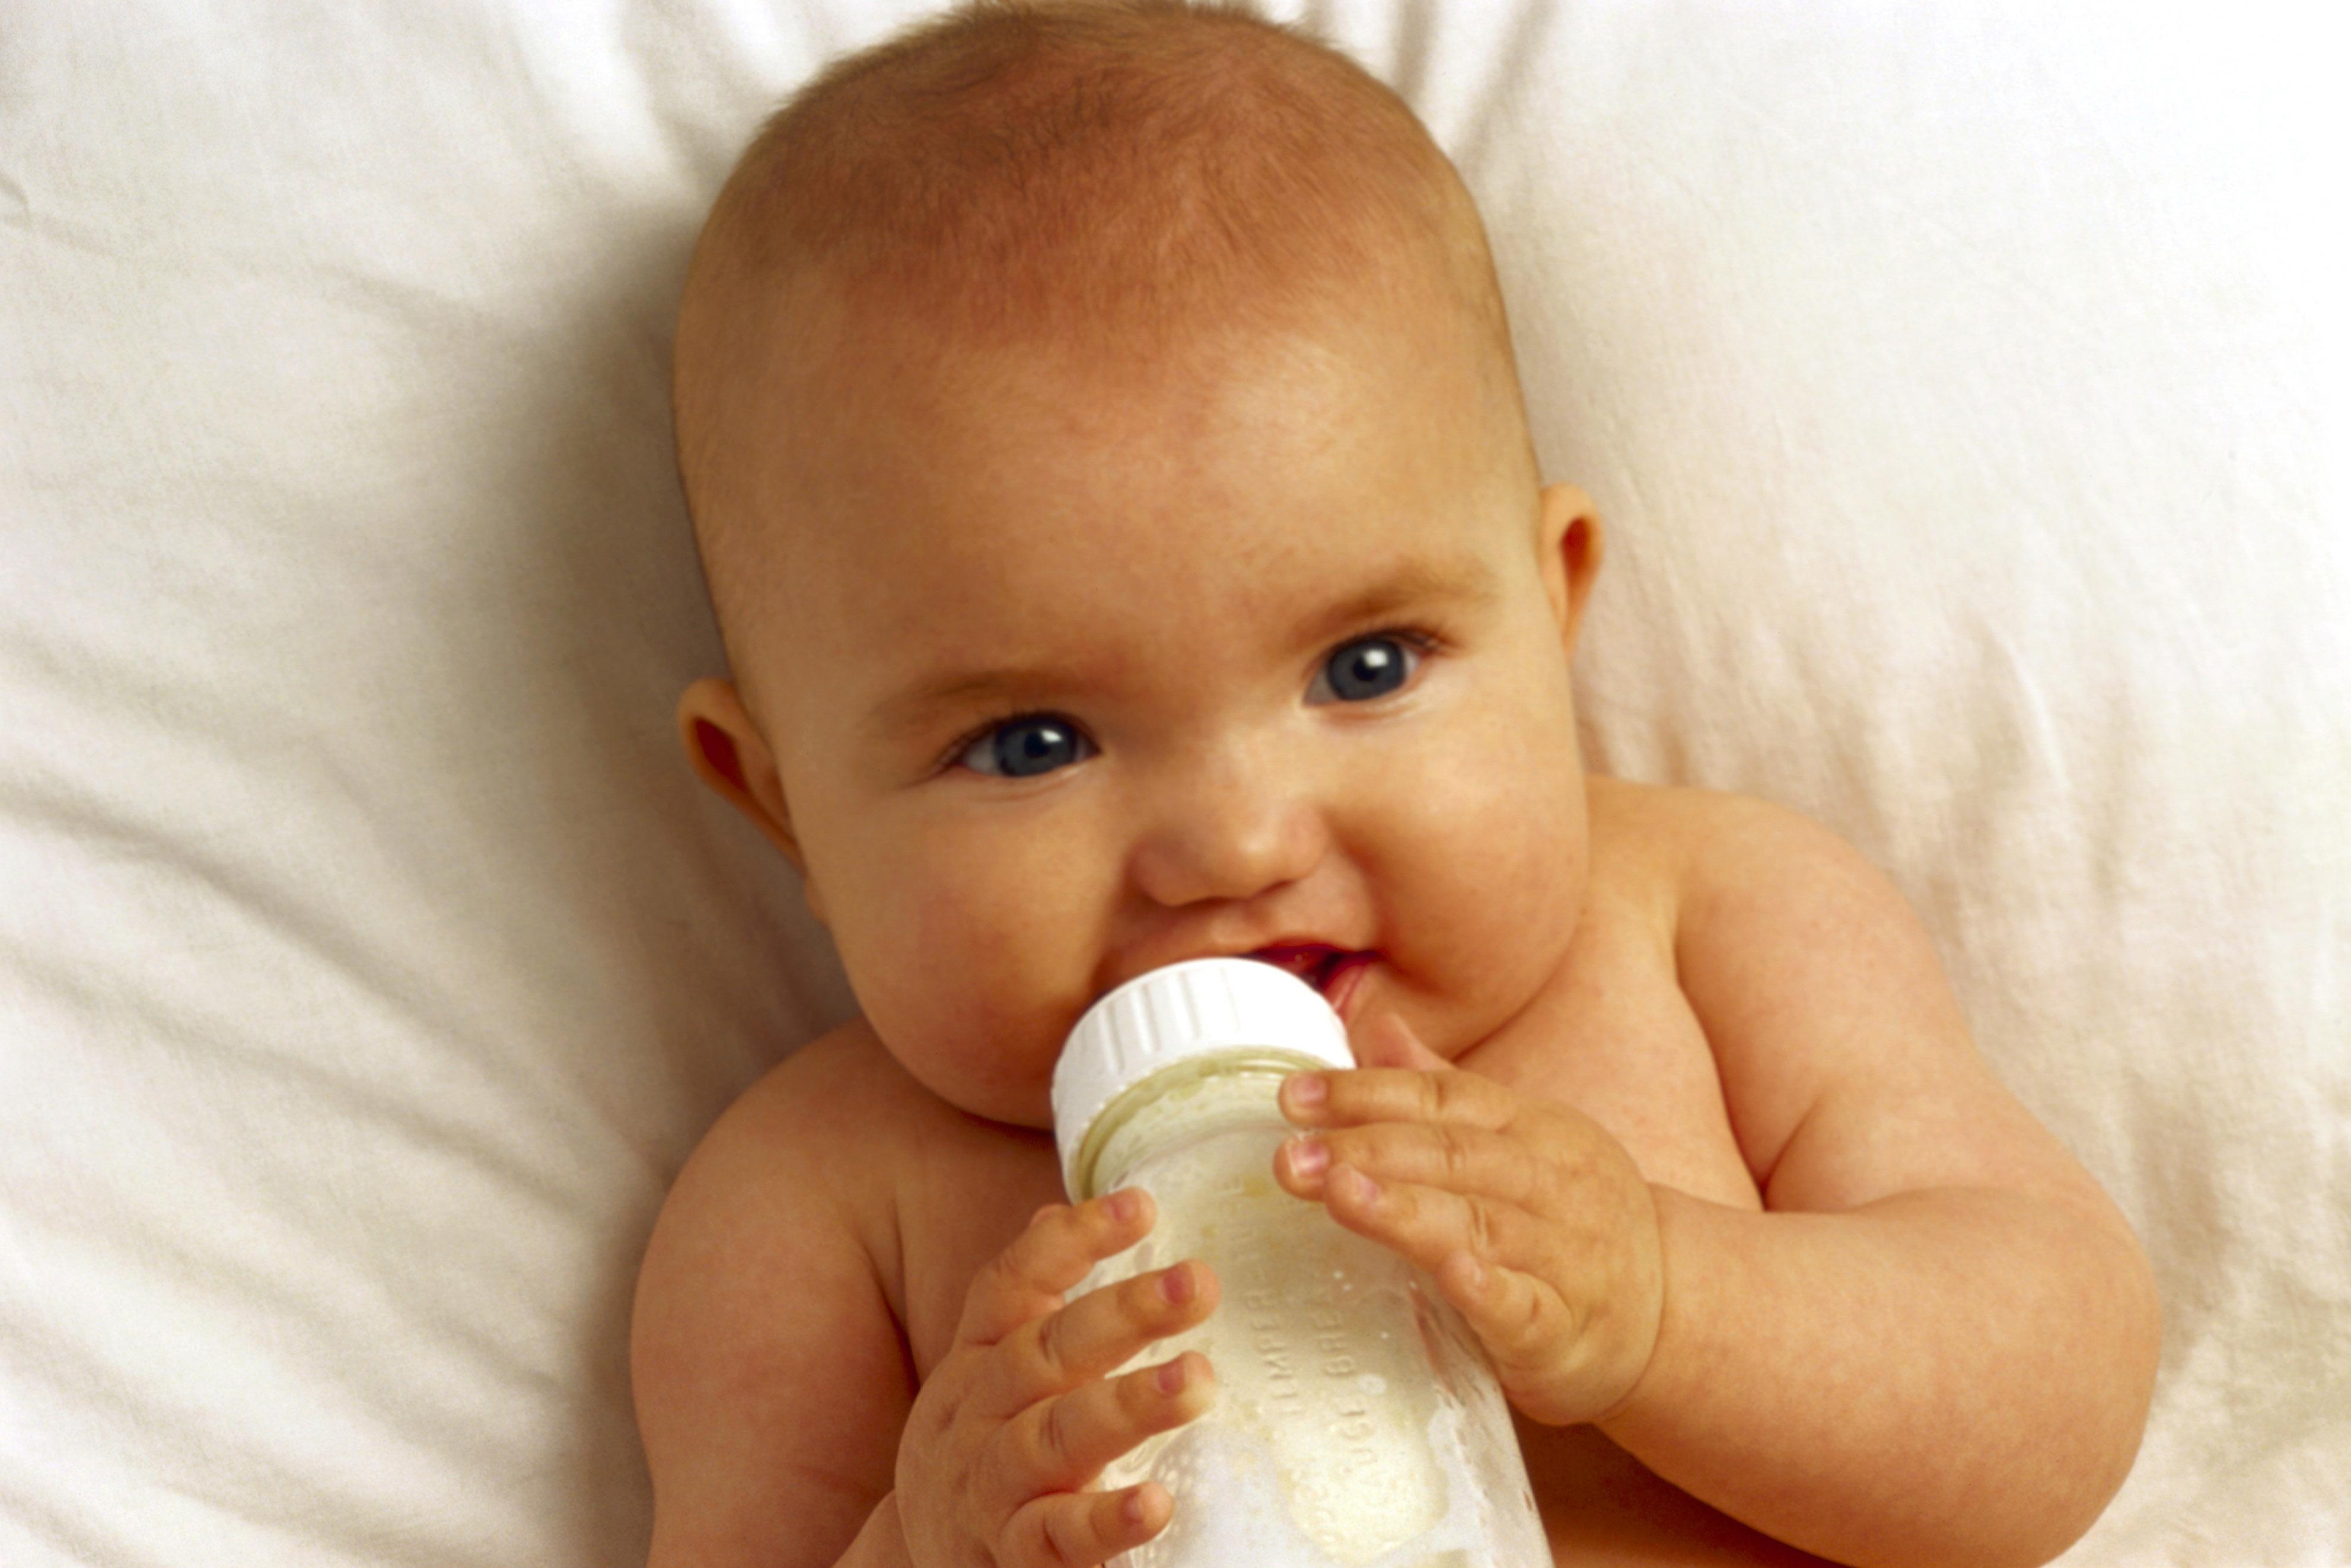 Бутылка VS. Чашка: как научить малыша пить из чашки